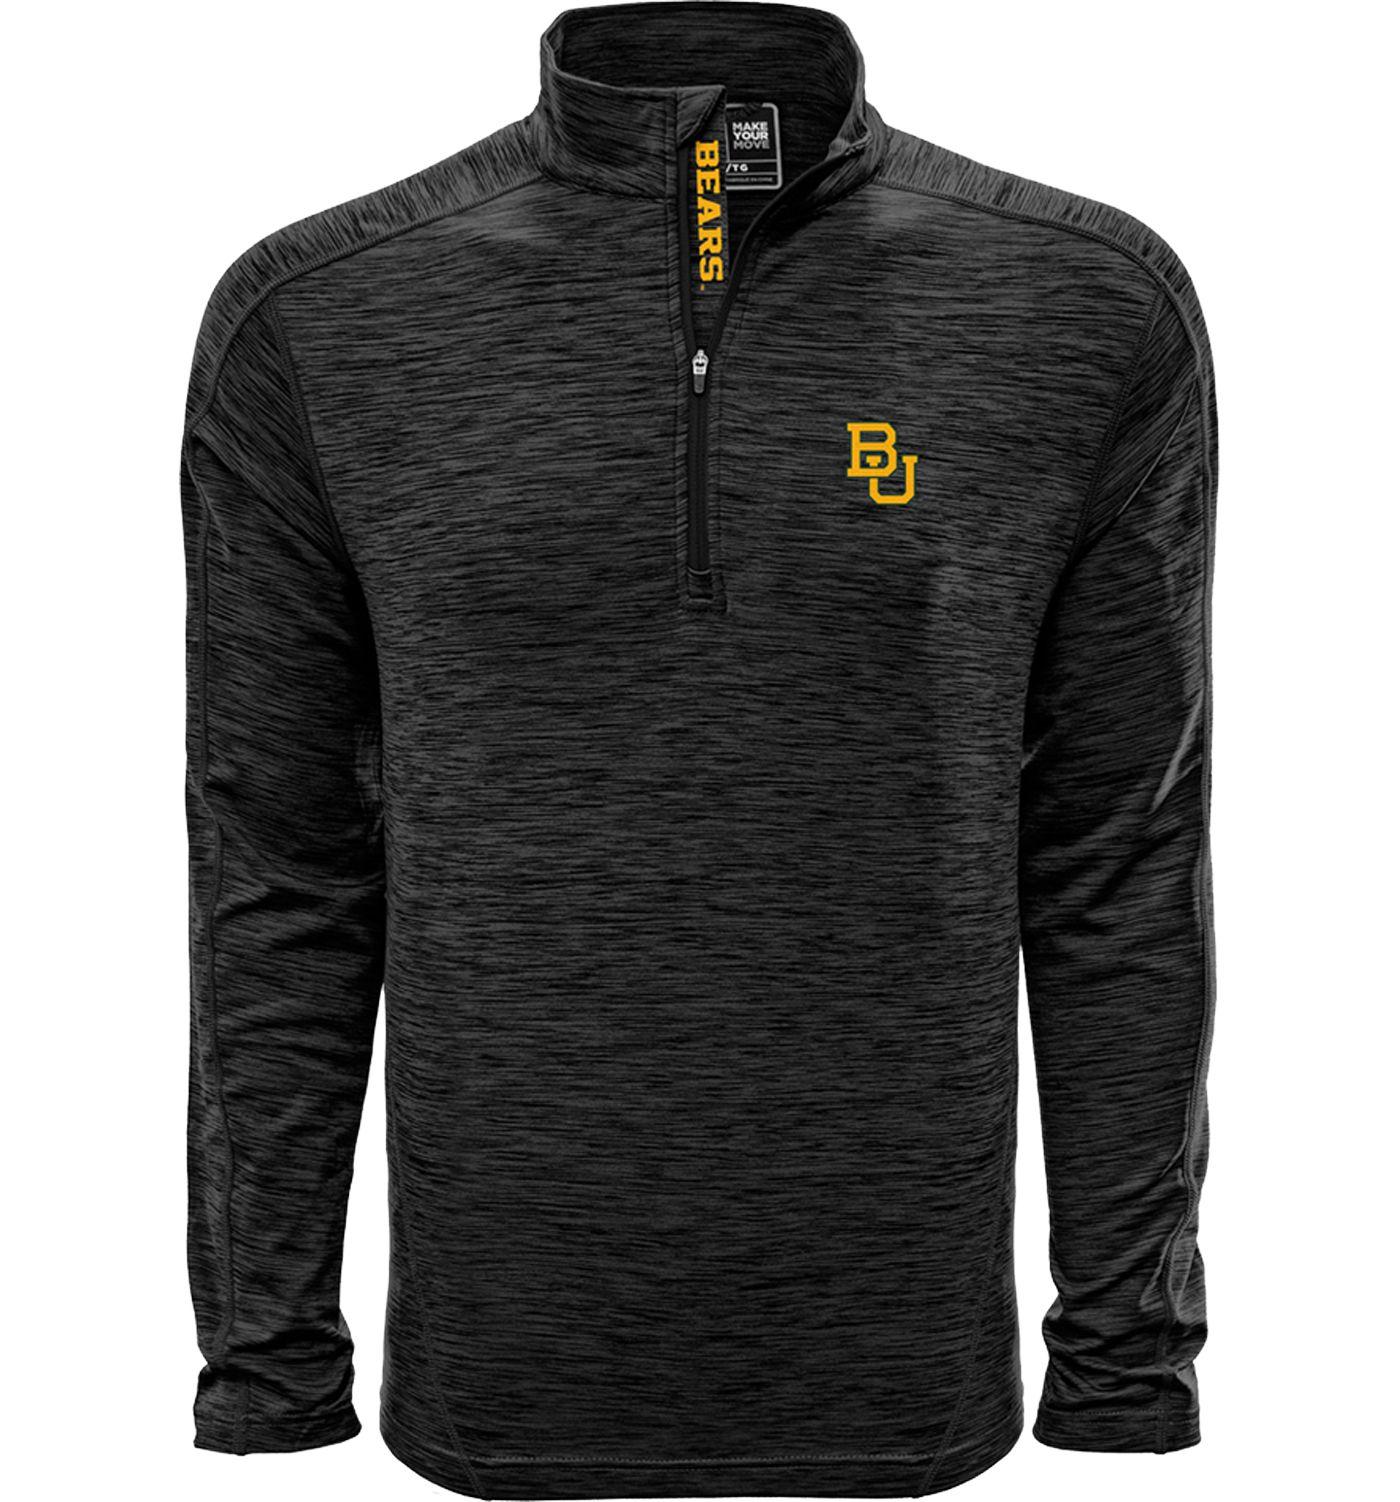 Levelwear Men's Baylor Bears Grey Armour Quarter-Zip Shirt